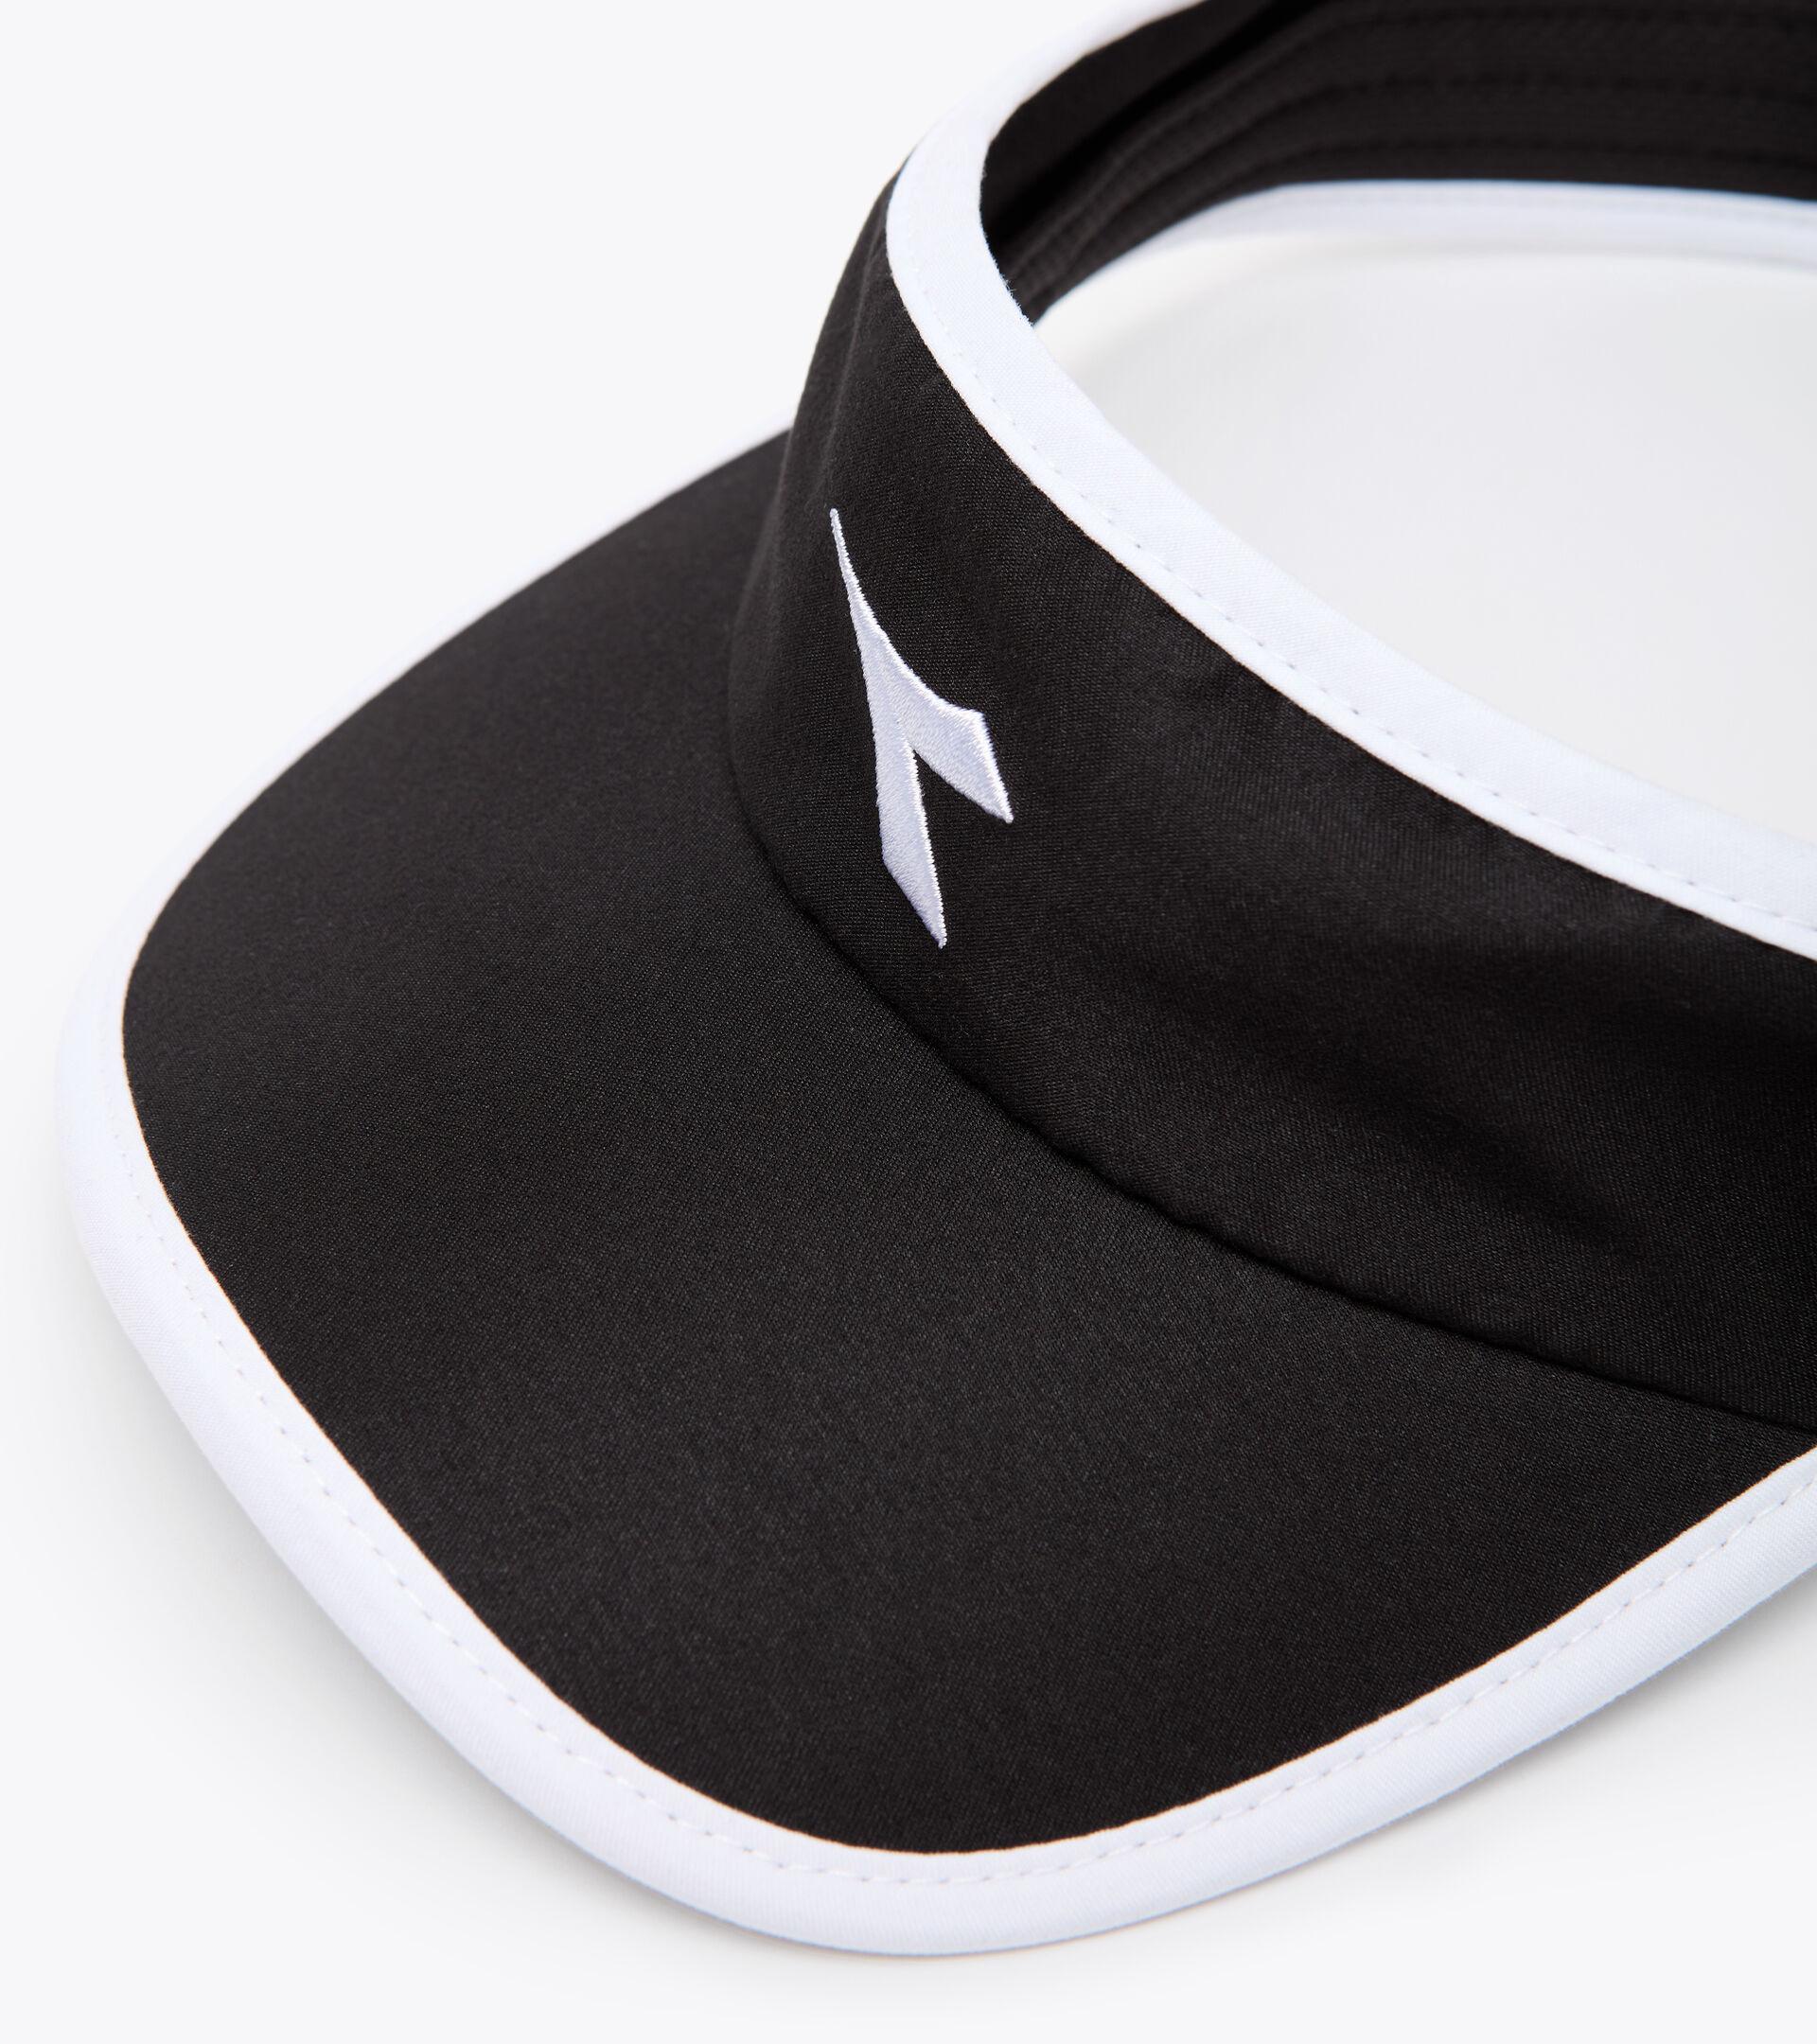 Accessories Sport UNISEX VISOR BLACK/OPTICAL WHITE Diadora